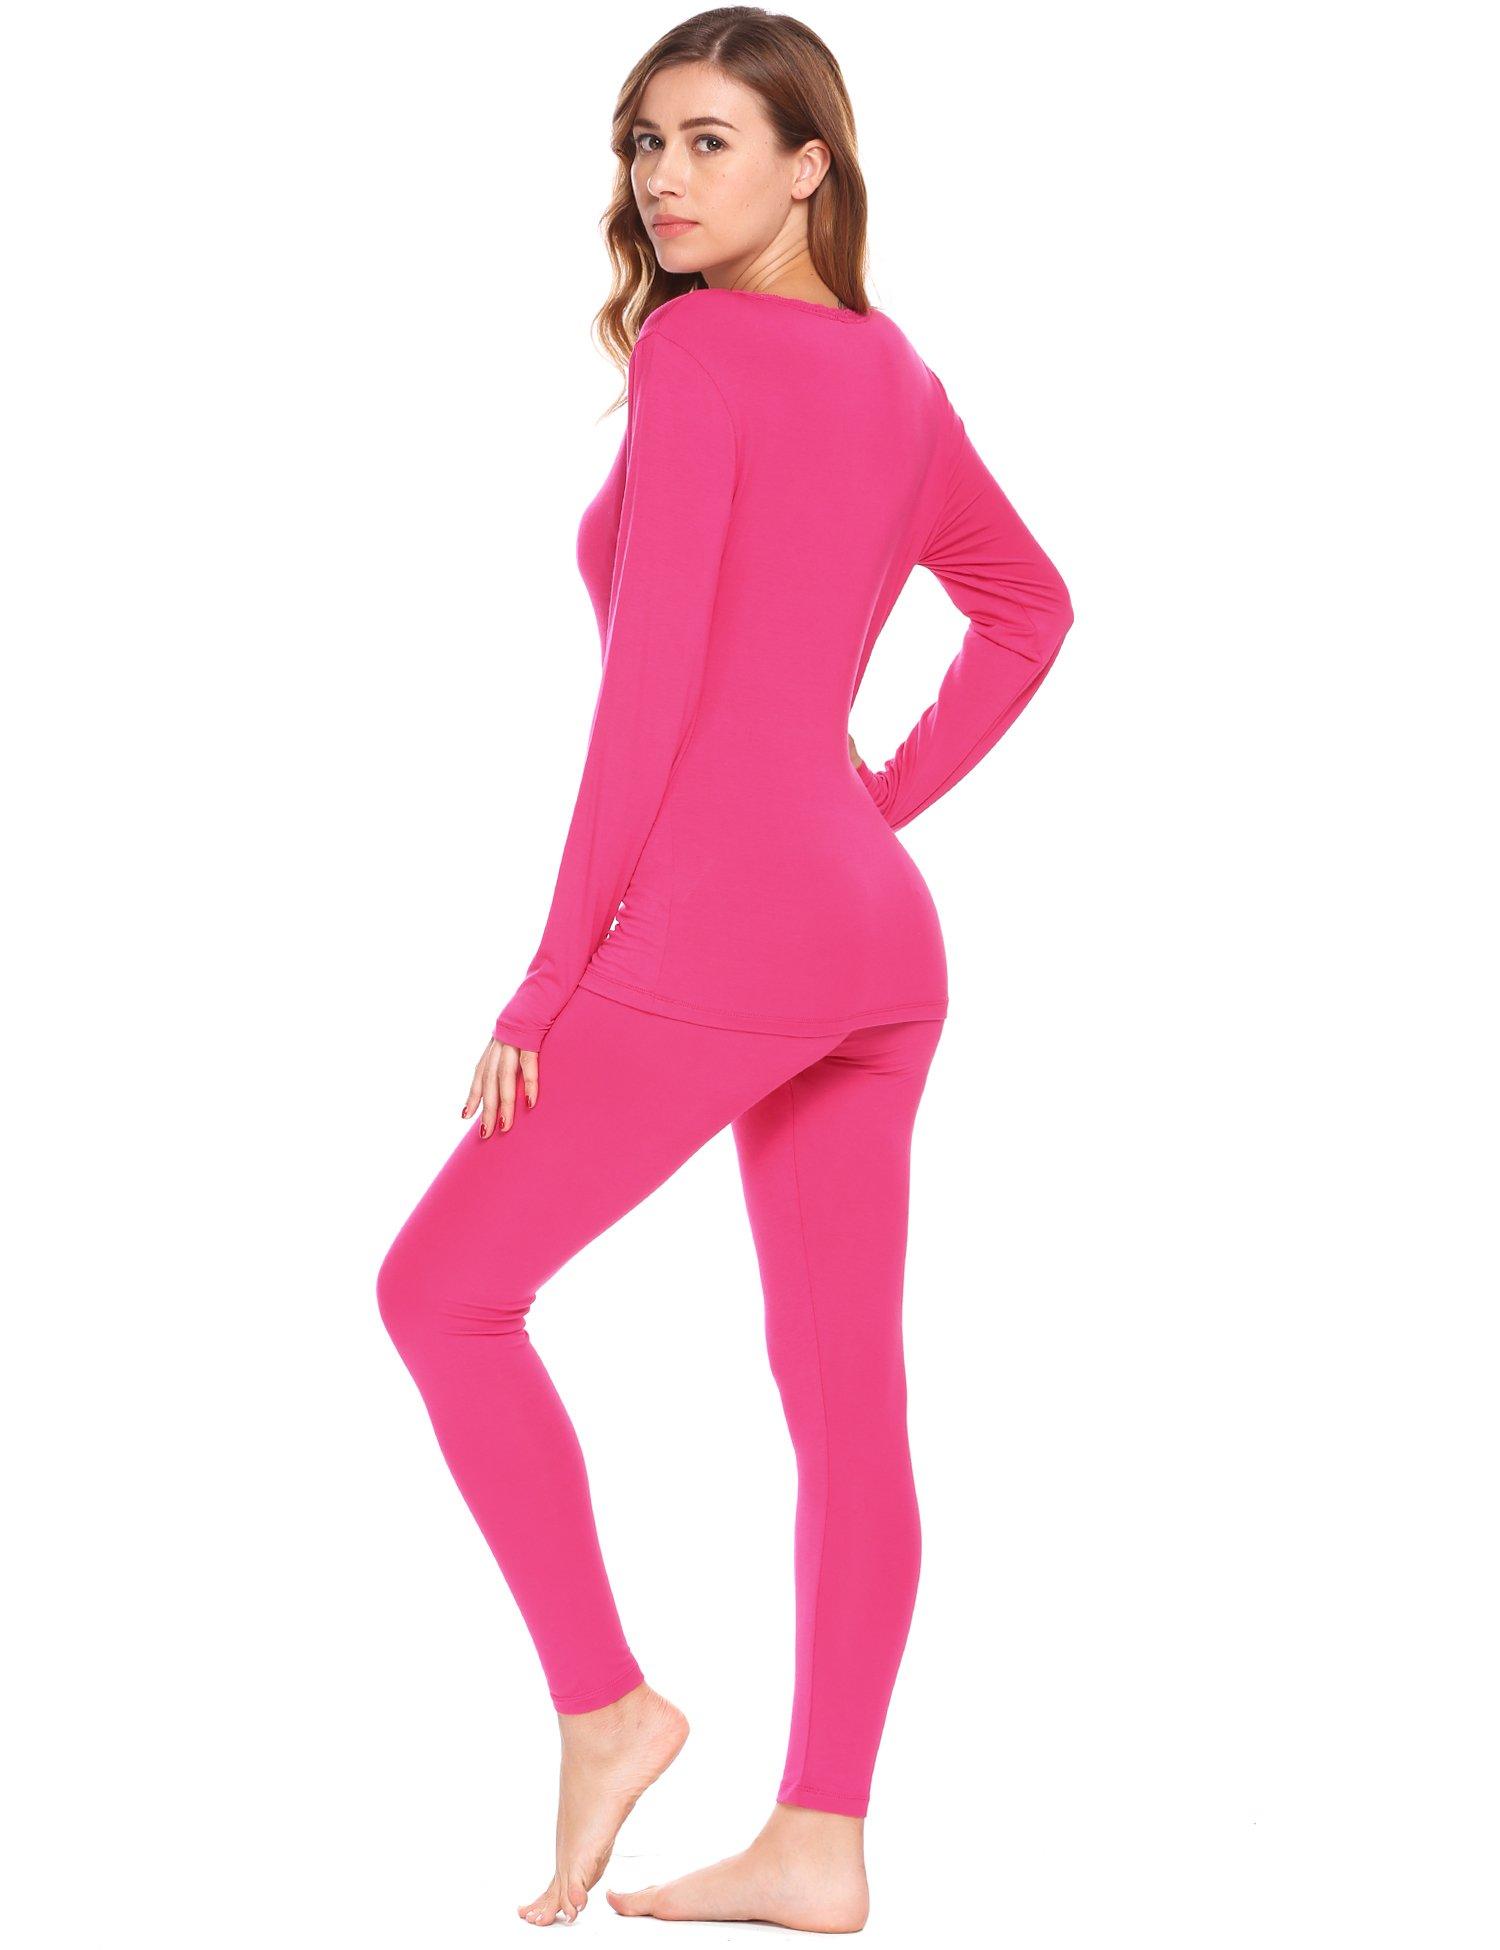 Avidlove Womens Soft Thermal Underwear Set Top & Bottom Long Johns Set PJS